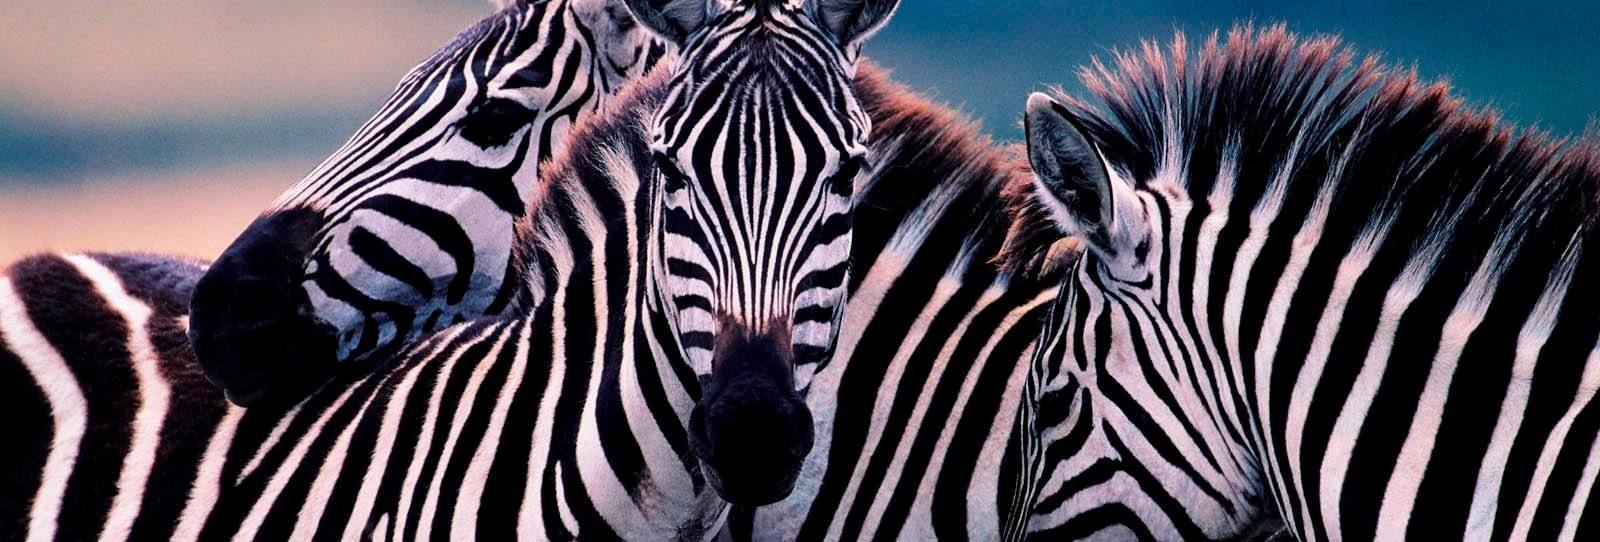 Deco Block »Zebras« 118/40 cm